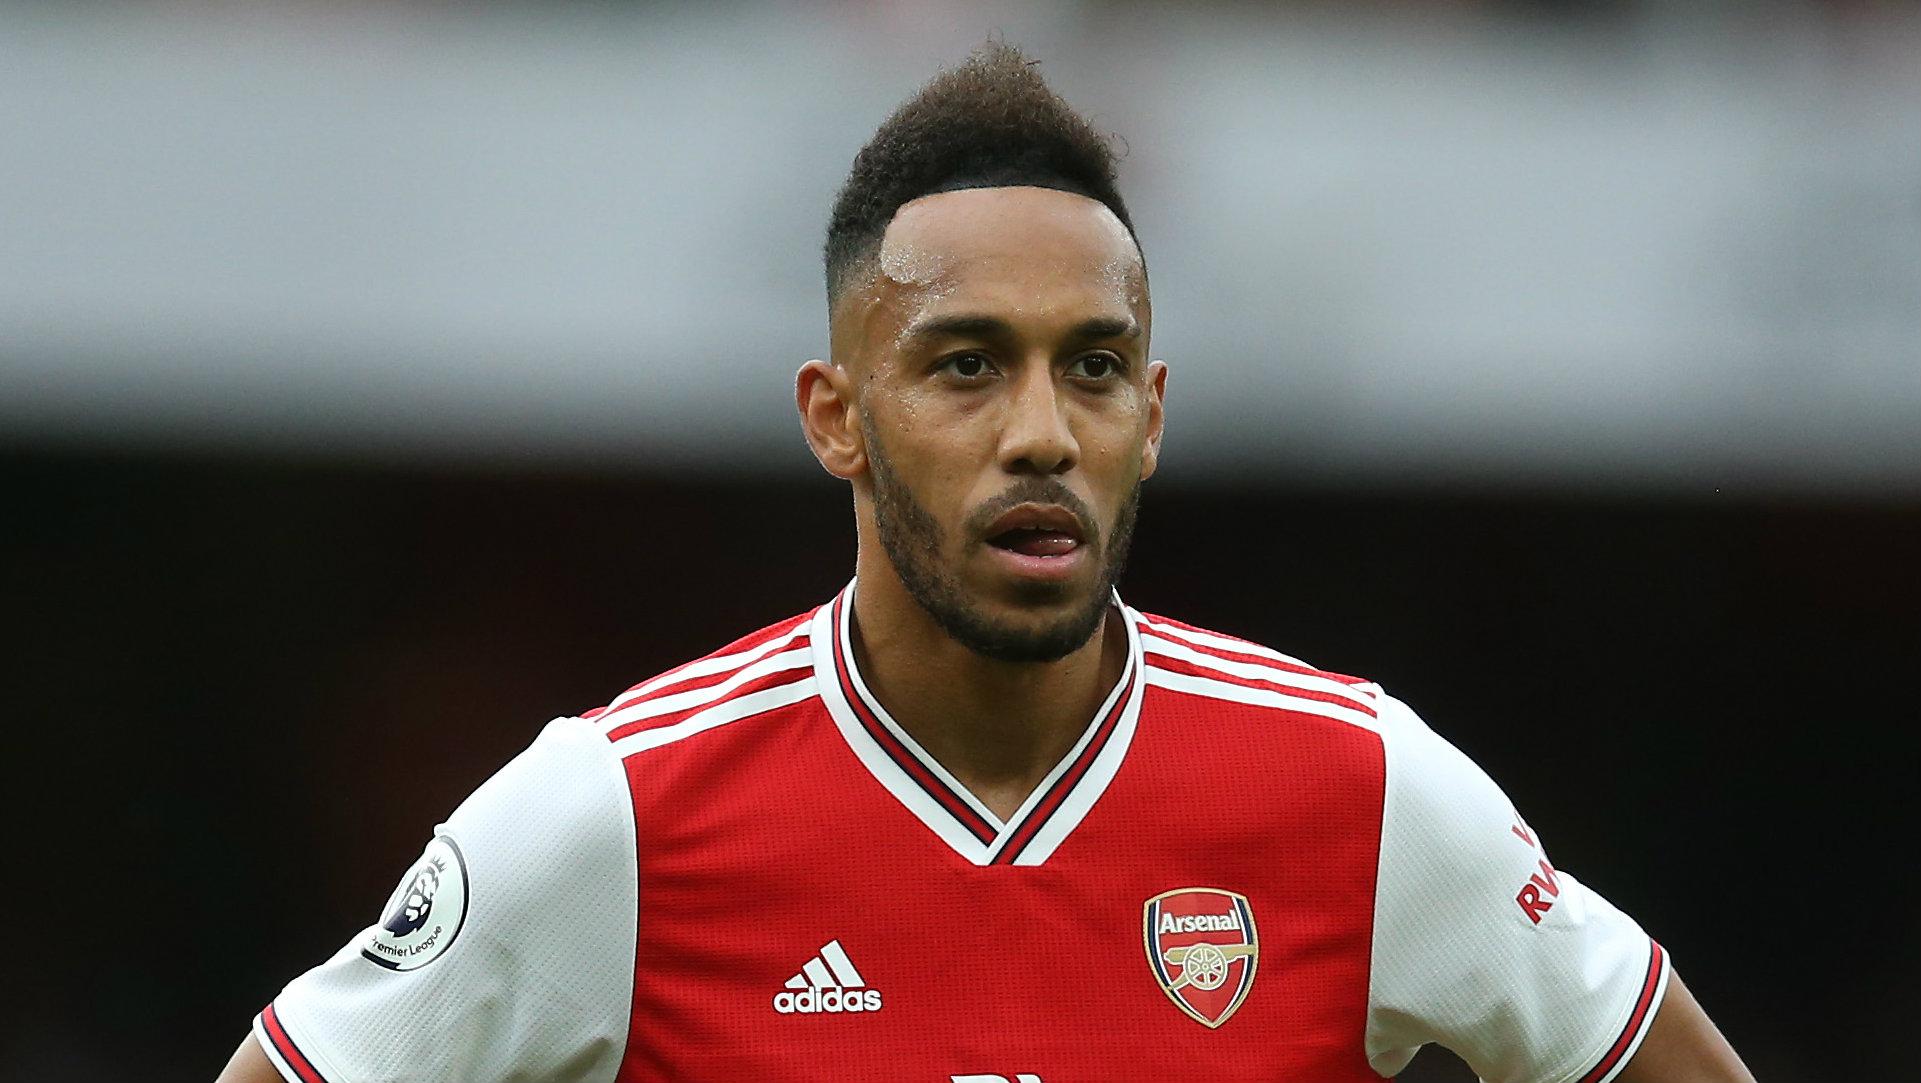 Arsenal wants 30m for aubameyang  - Bóng Đá